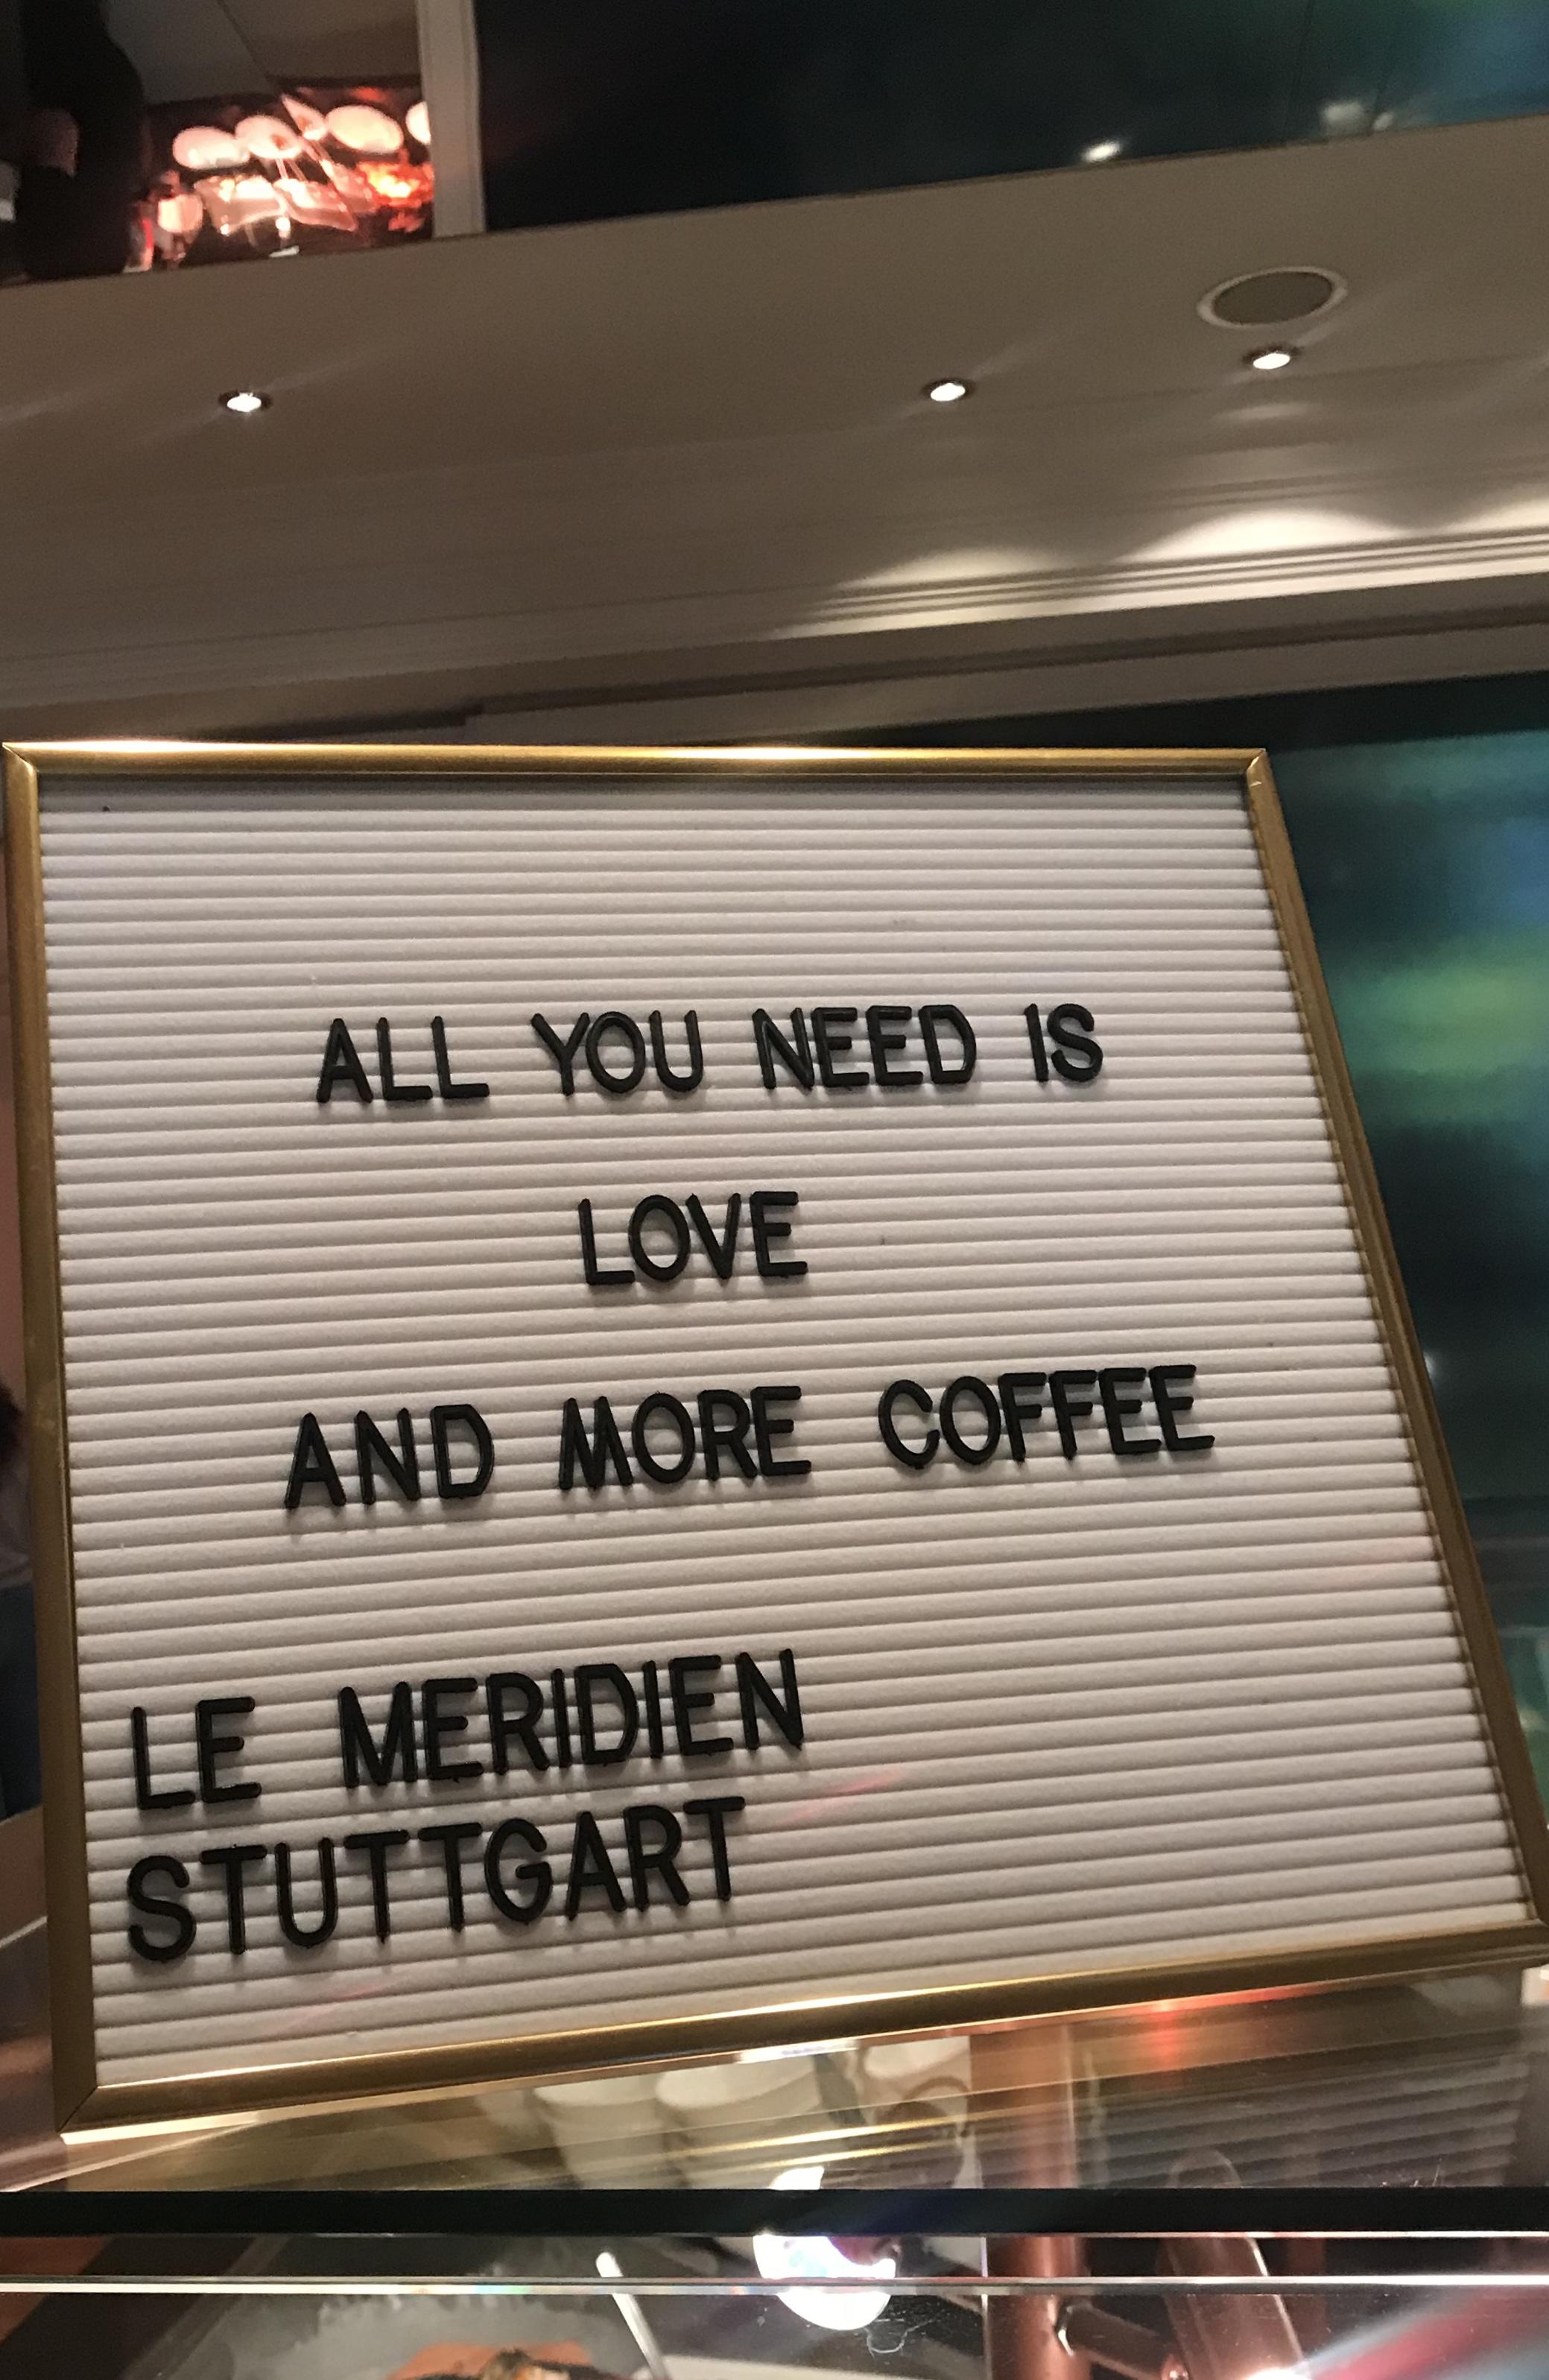 Das Hotel Le Méridien in Stuttgart